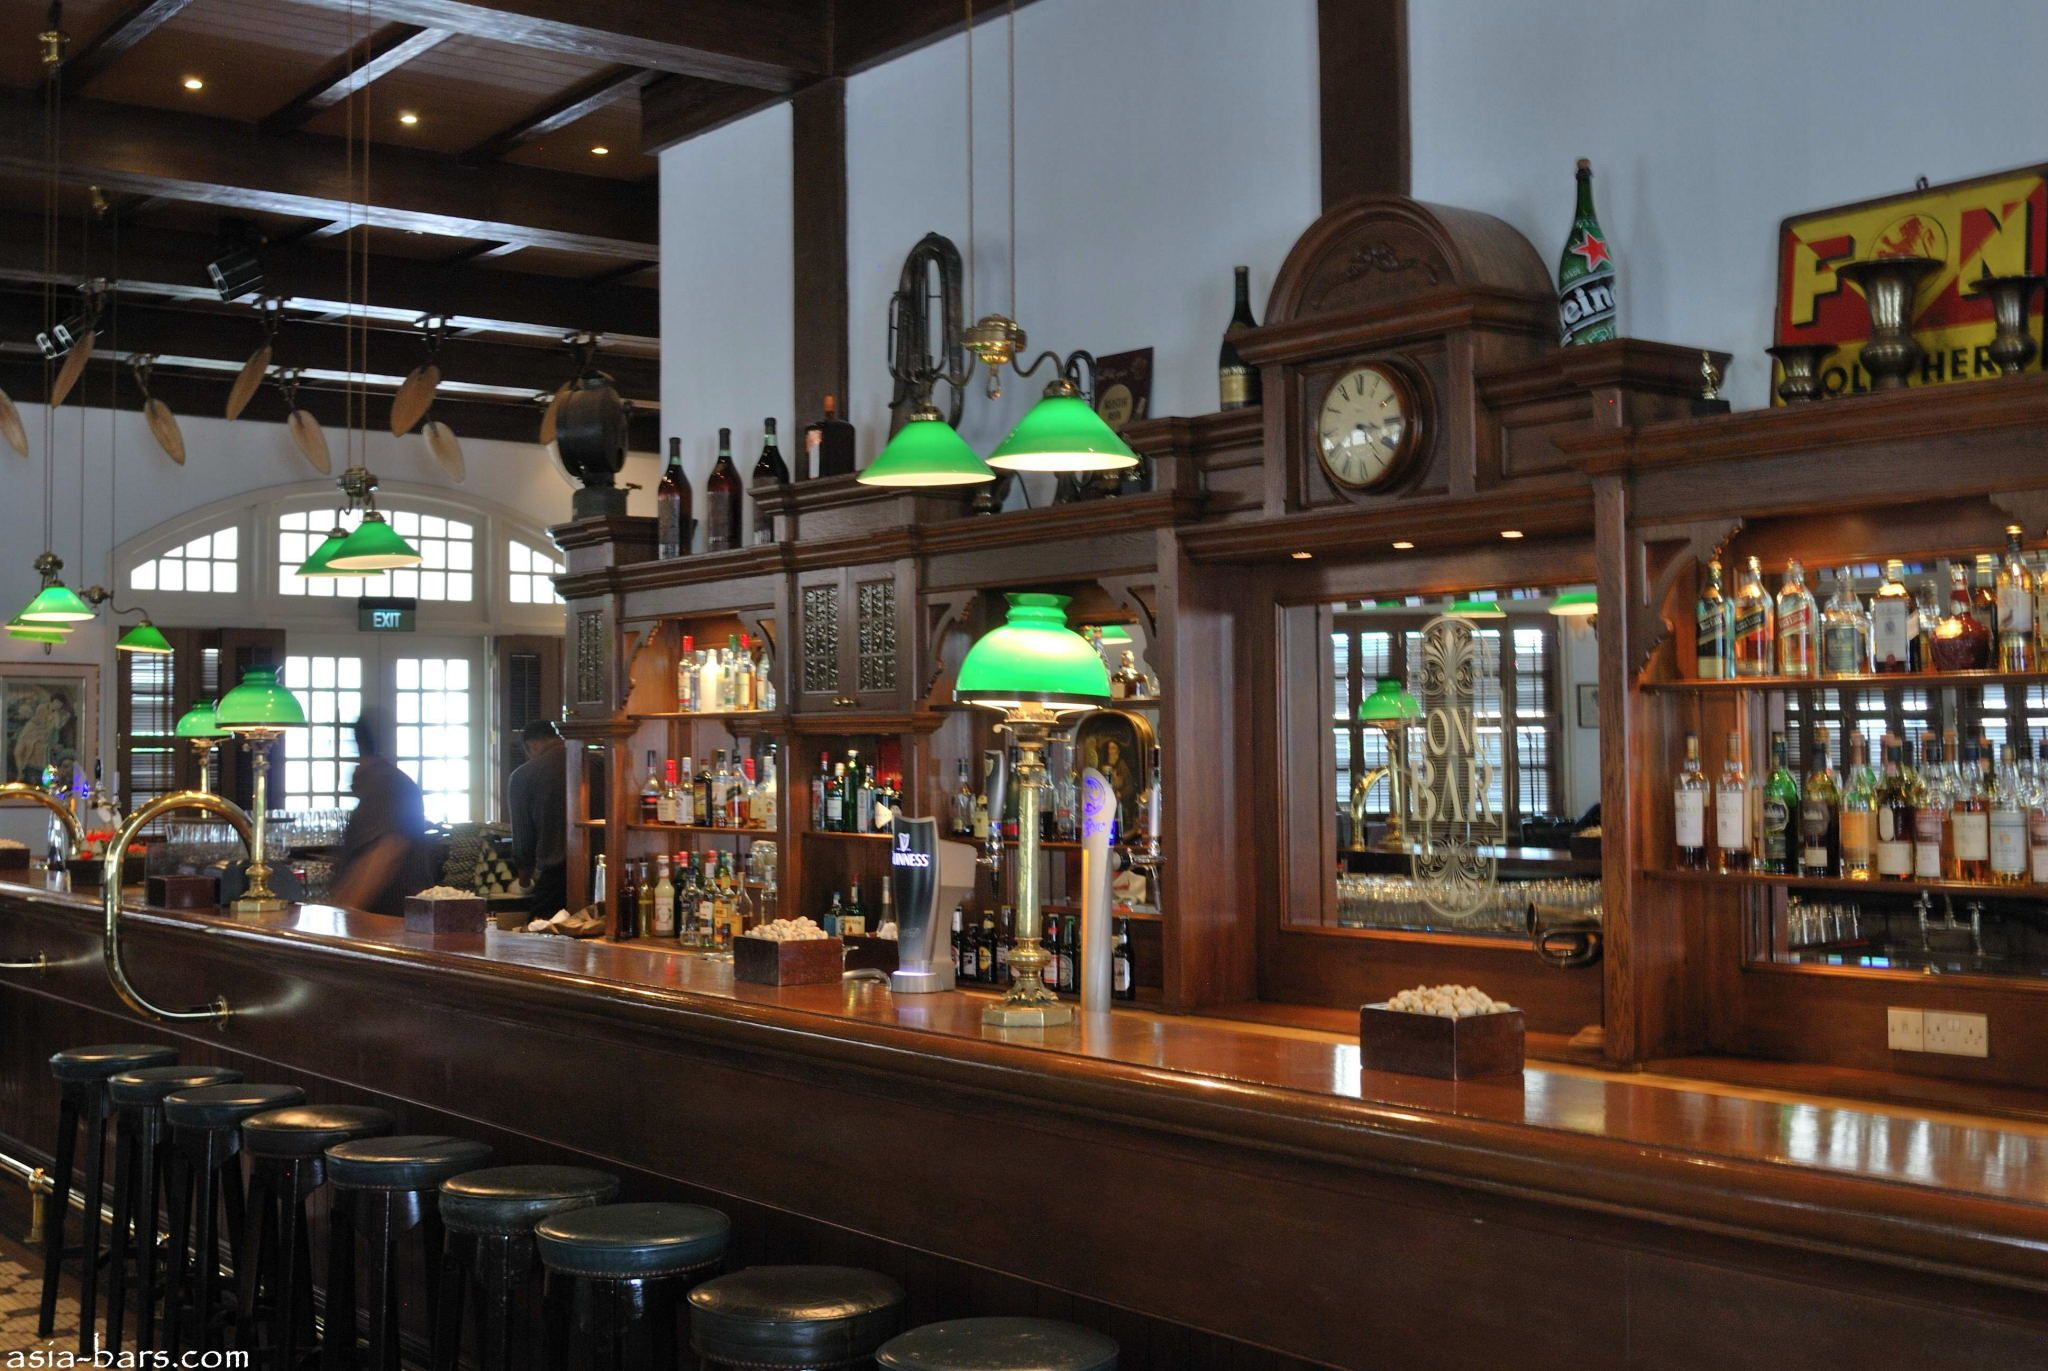 Long Bar Raffles Singapore Singapore Bar Hotel Cool Bars